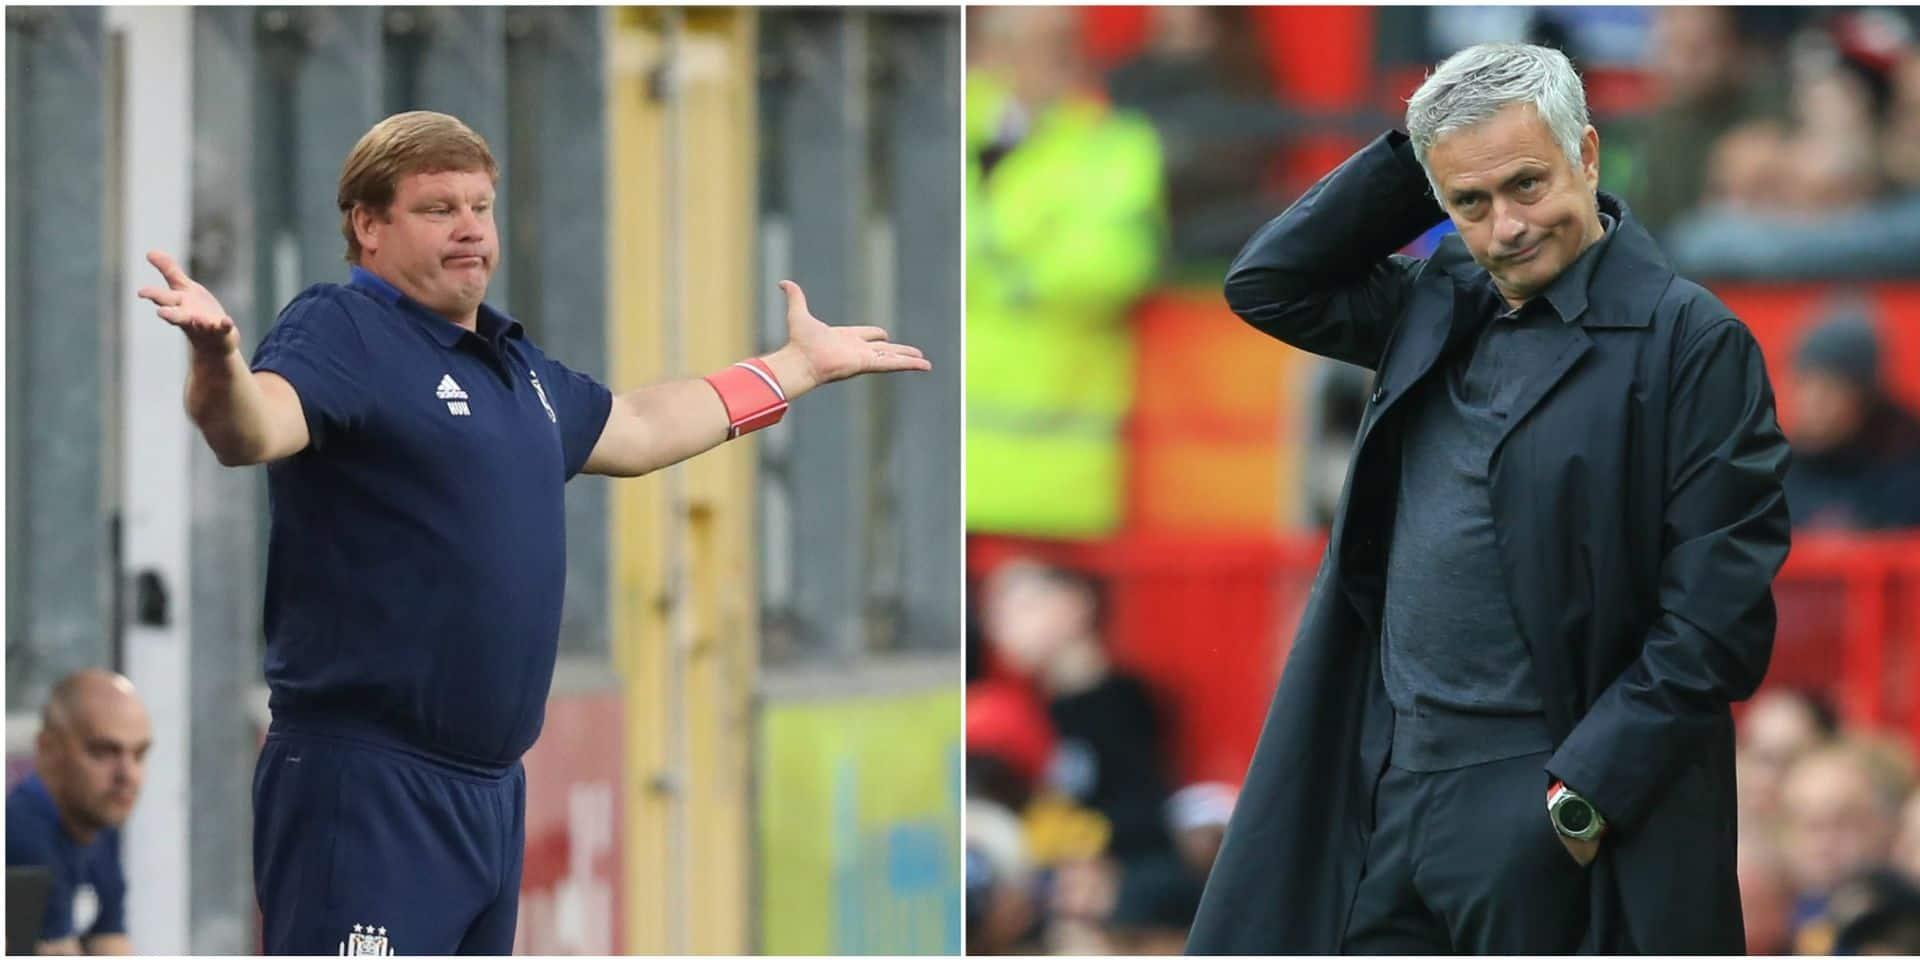 Vanhaezebrouck et Mourinho, même combat